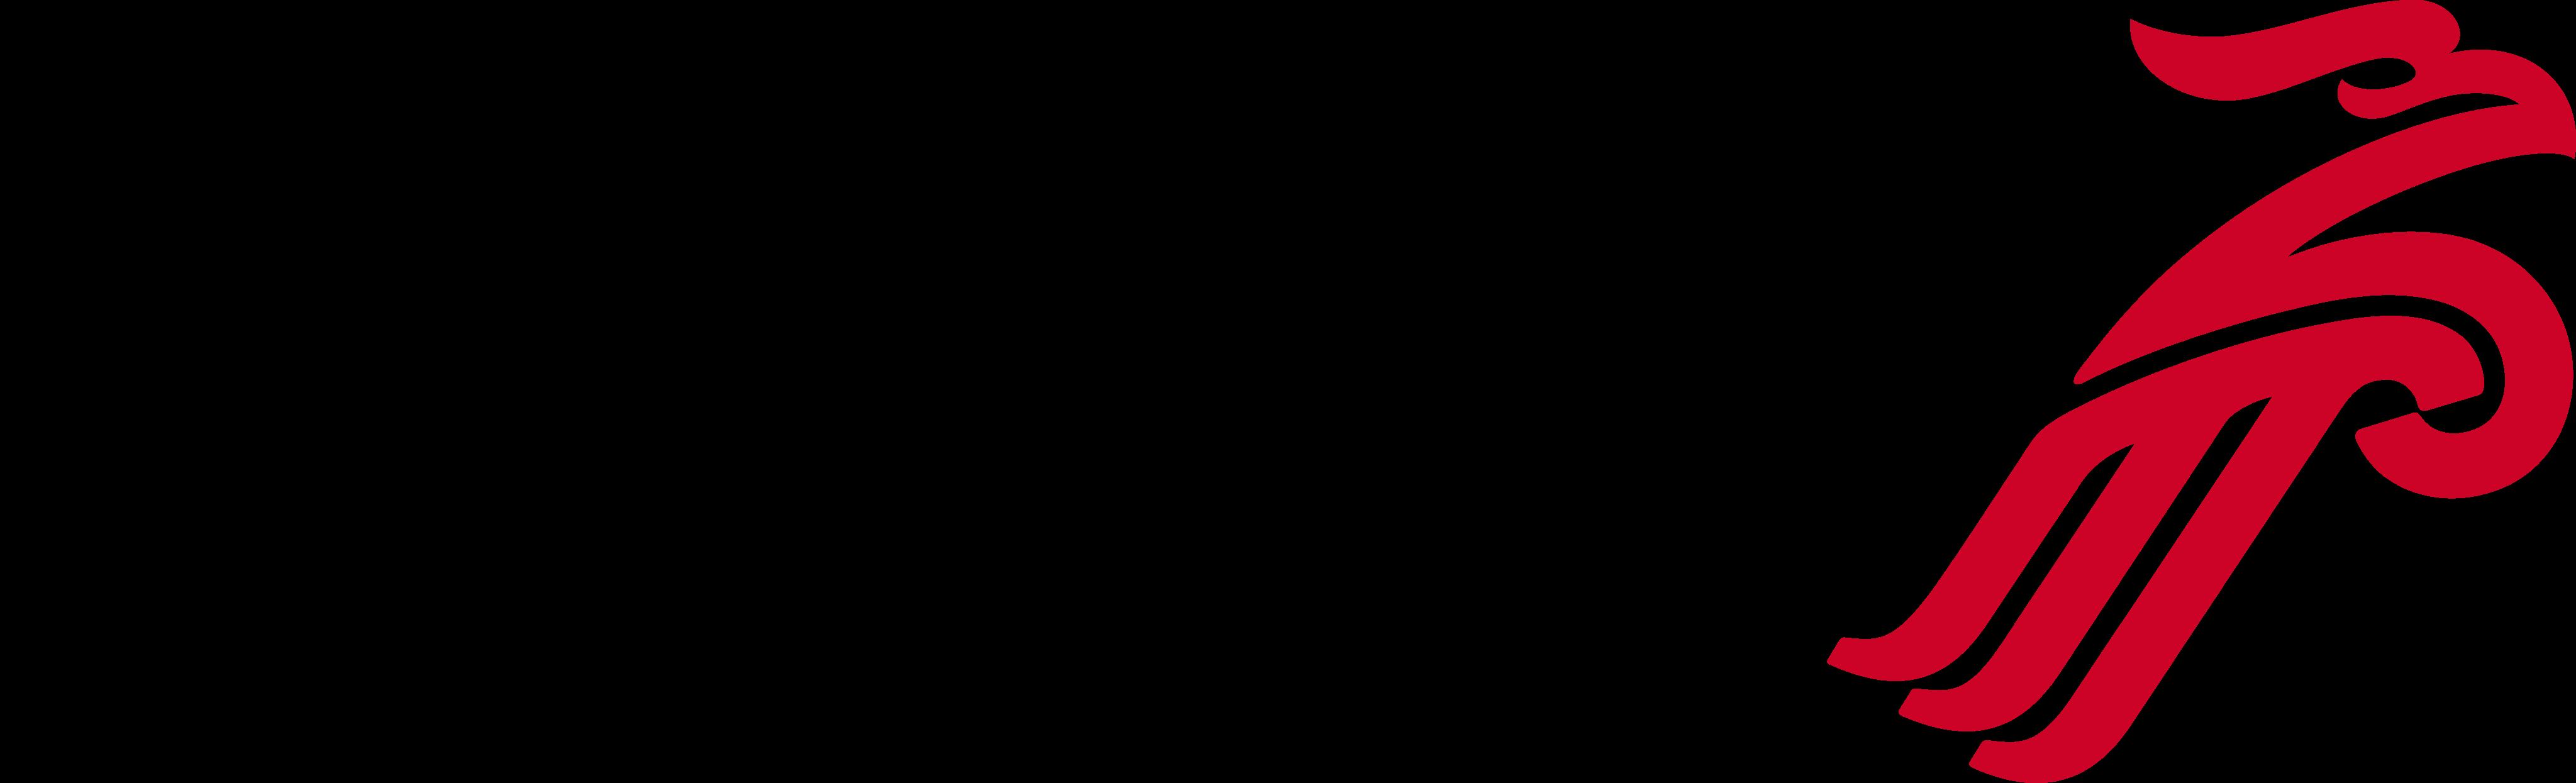 shenzhen airlines logo 1 - Shenzhen Airlines Logo